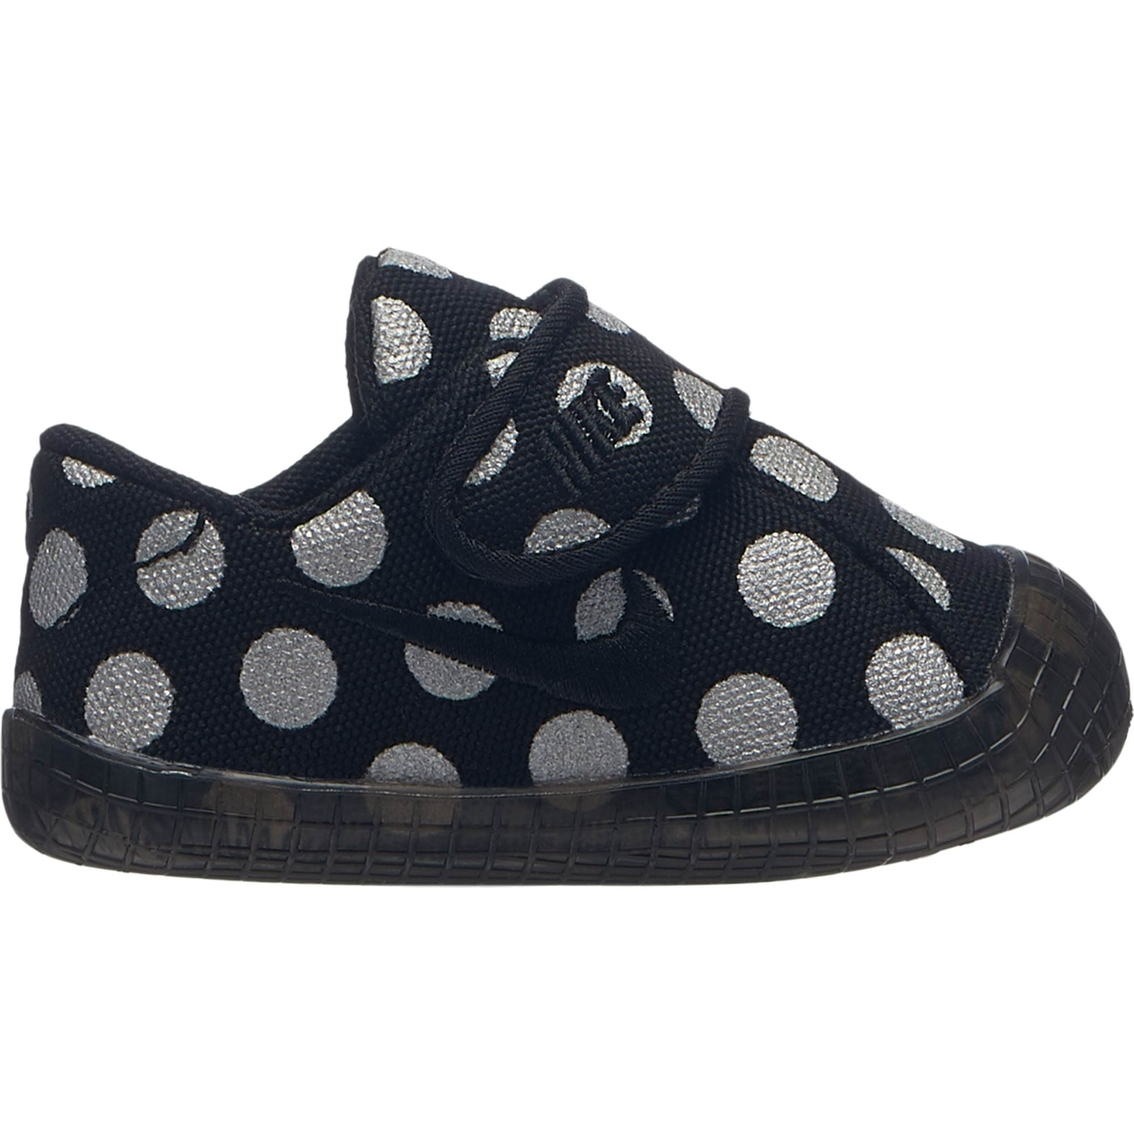 4a20874164db Nike Infant Girls Waffle 1 Crib Booties